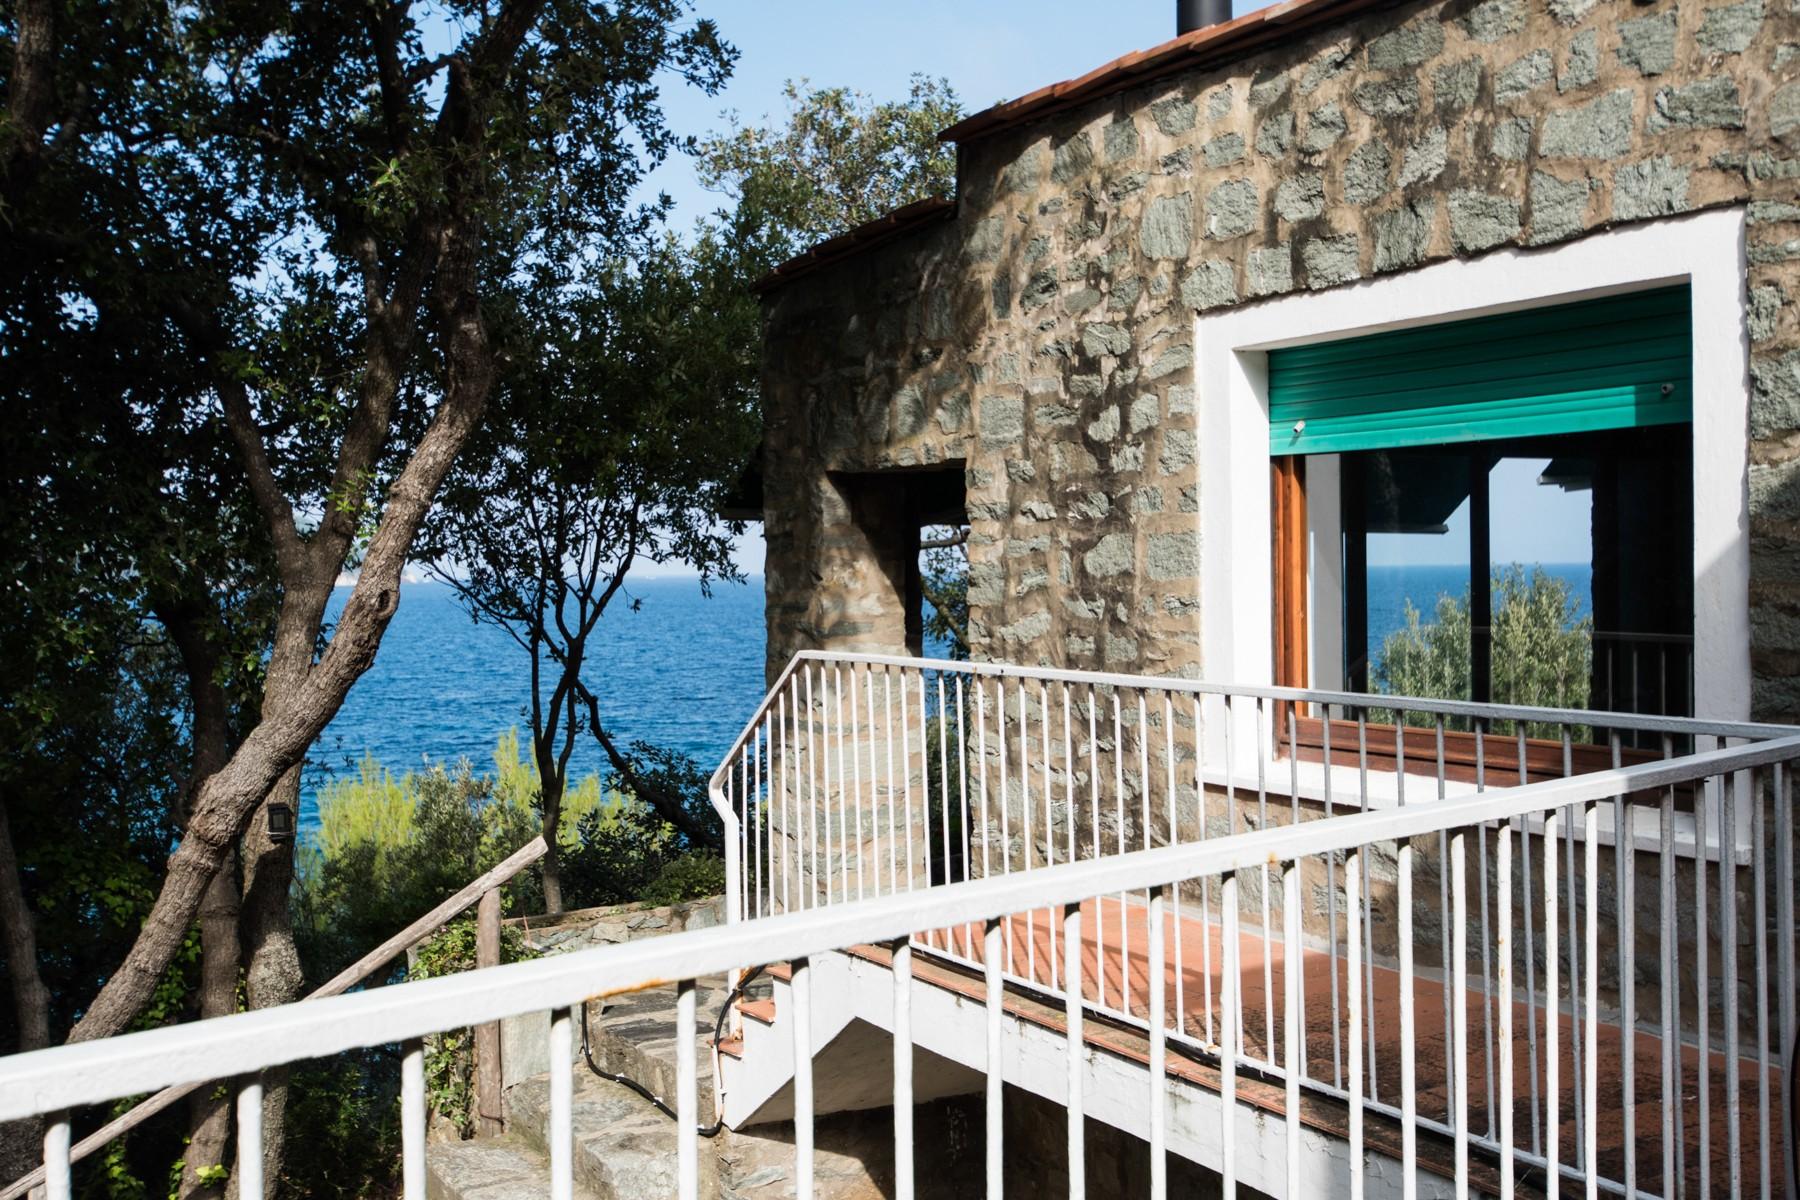 Villa in Vendita a Marciana: 5 locali, 300 mq - Foto 7